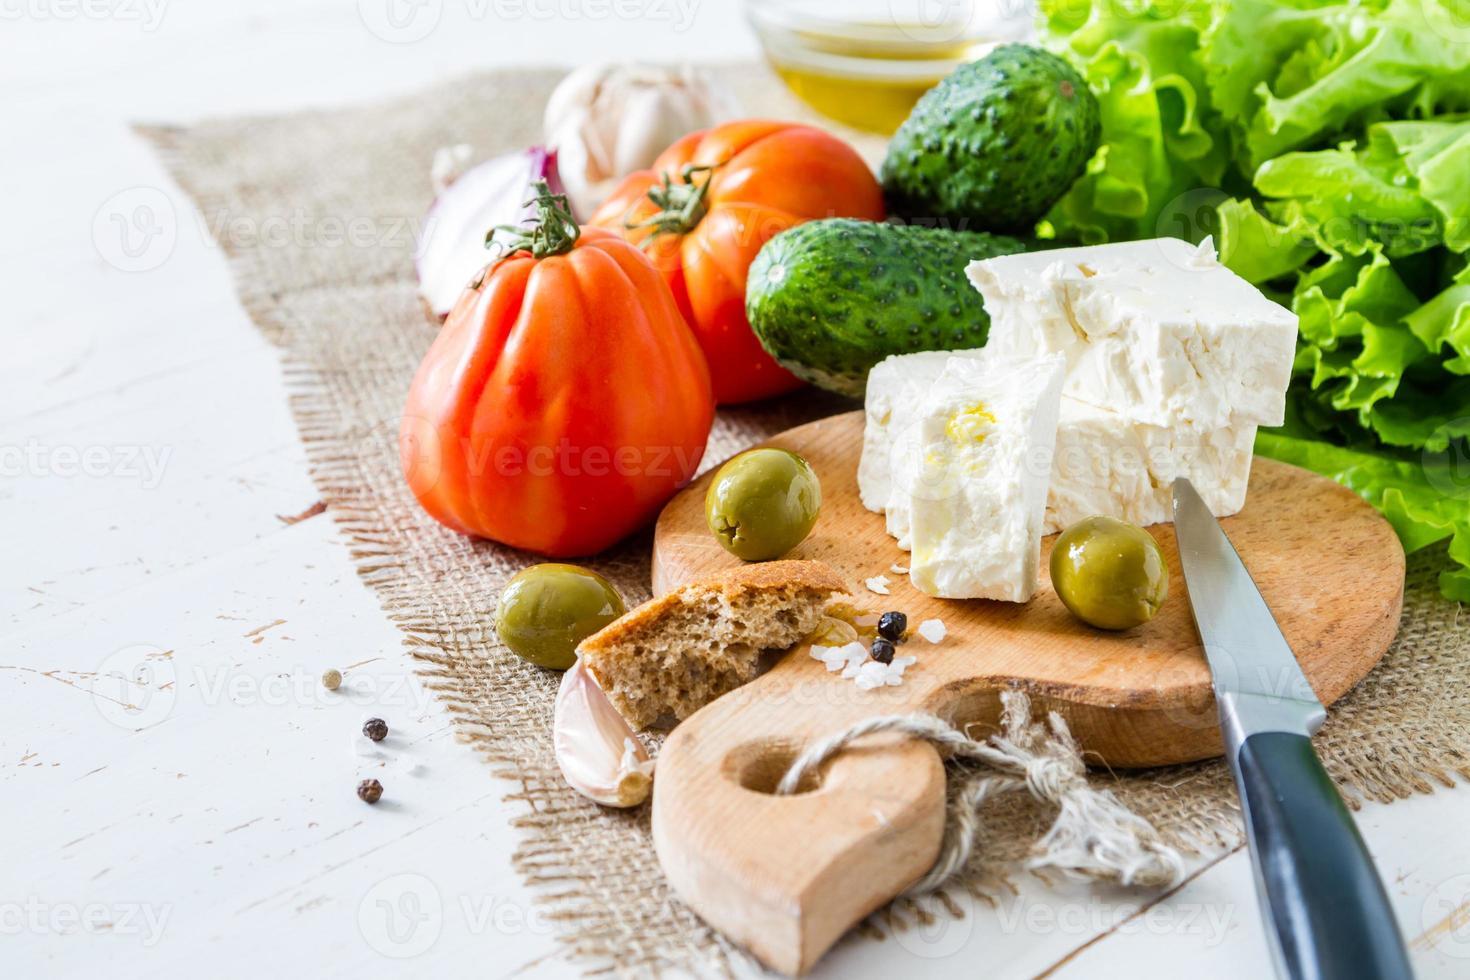 salade-ingrediënten - tomaat, sla, komkommer, feta, ui, olijf, knoflook foto